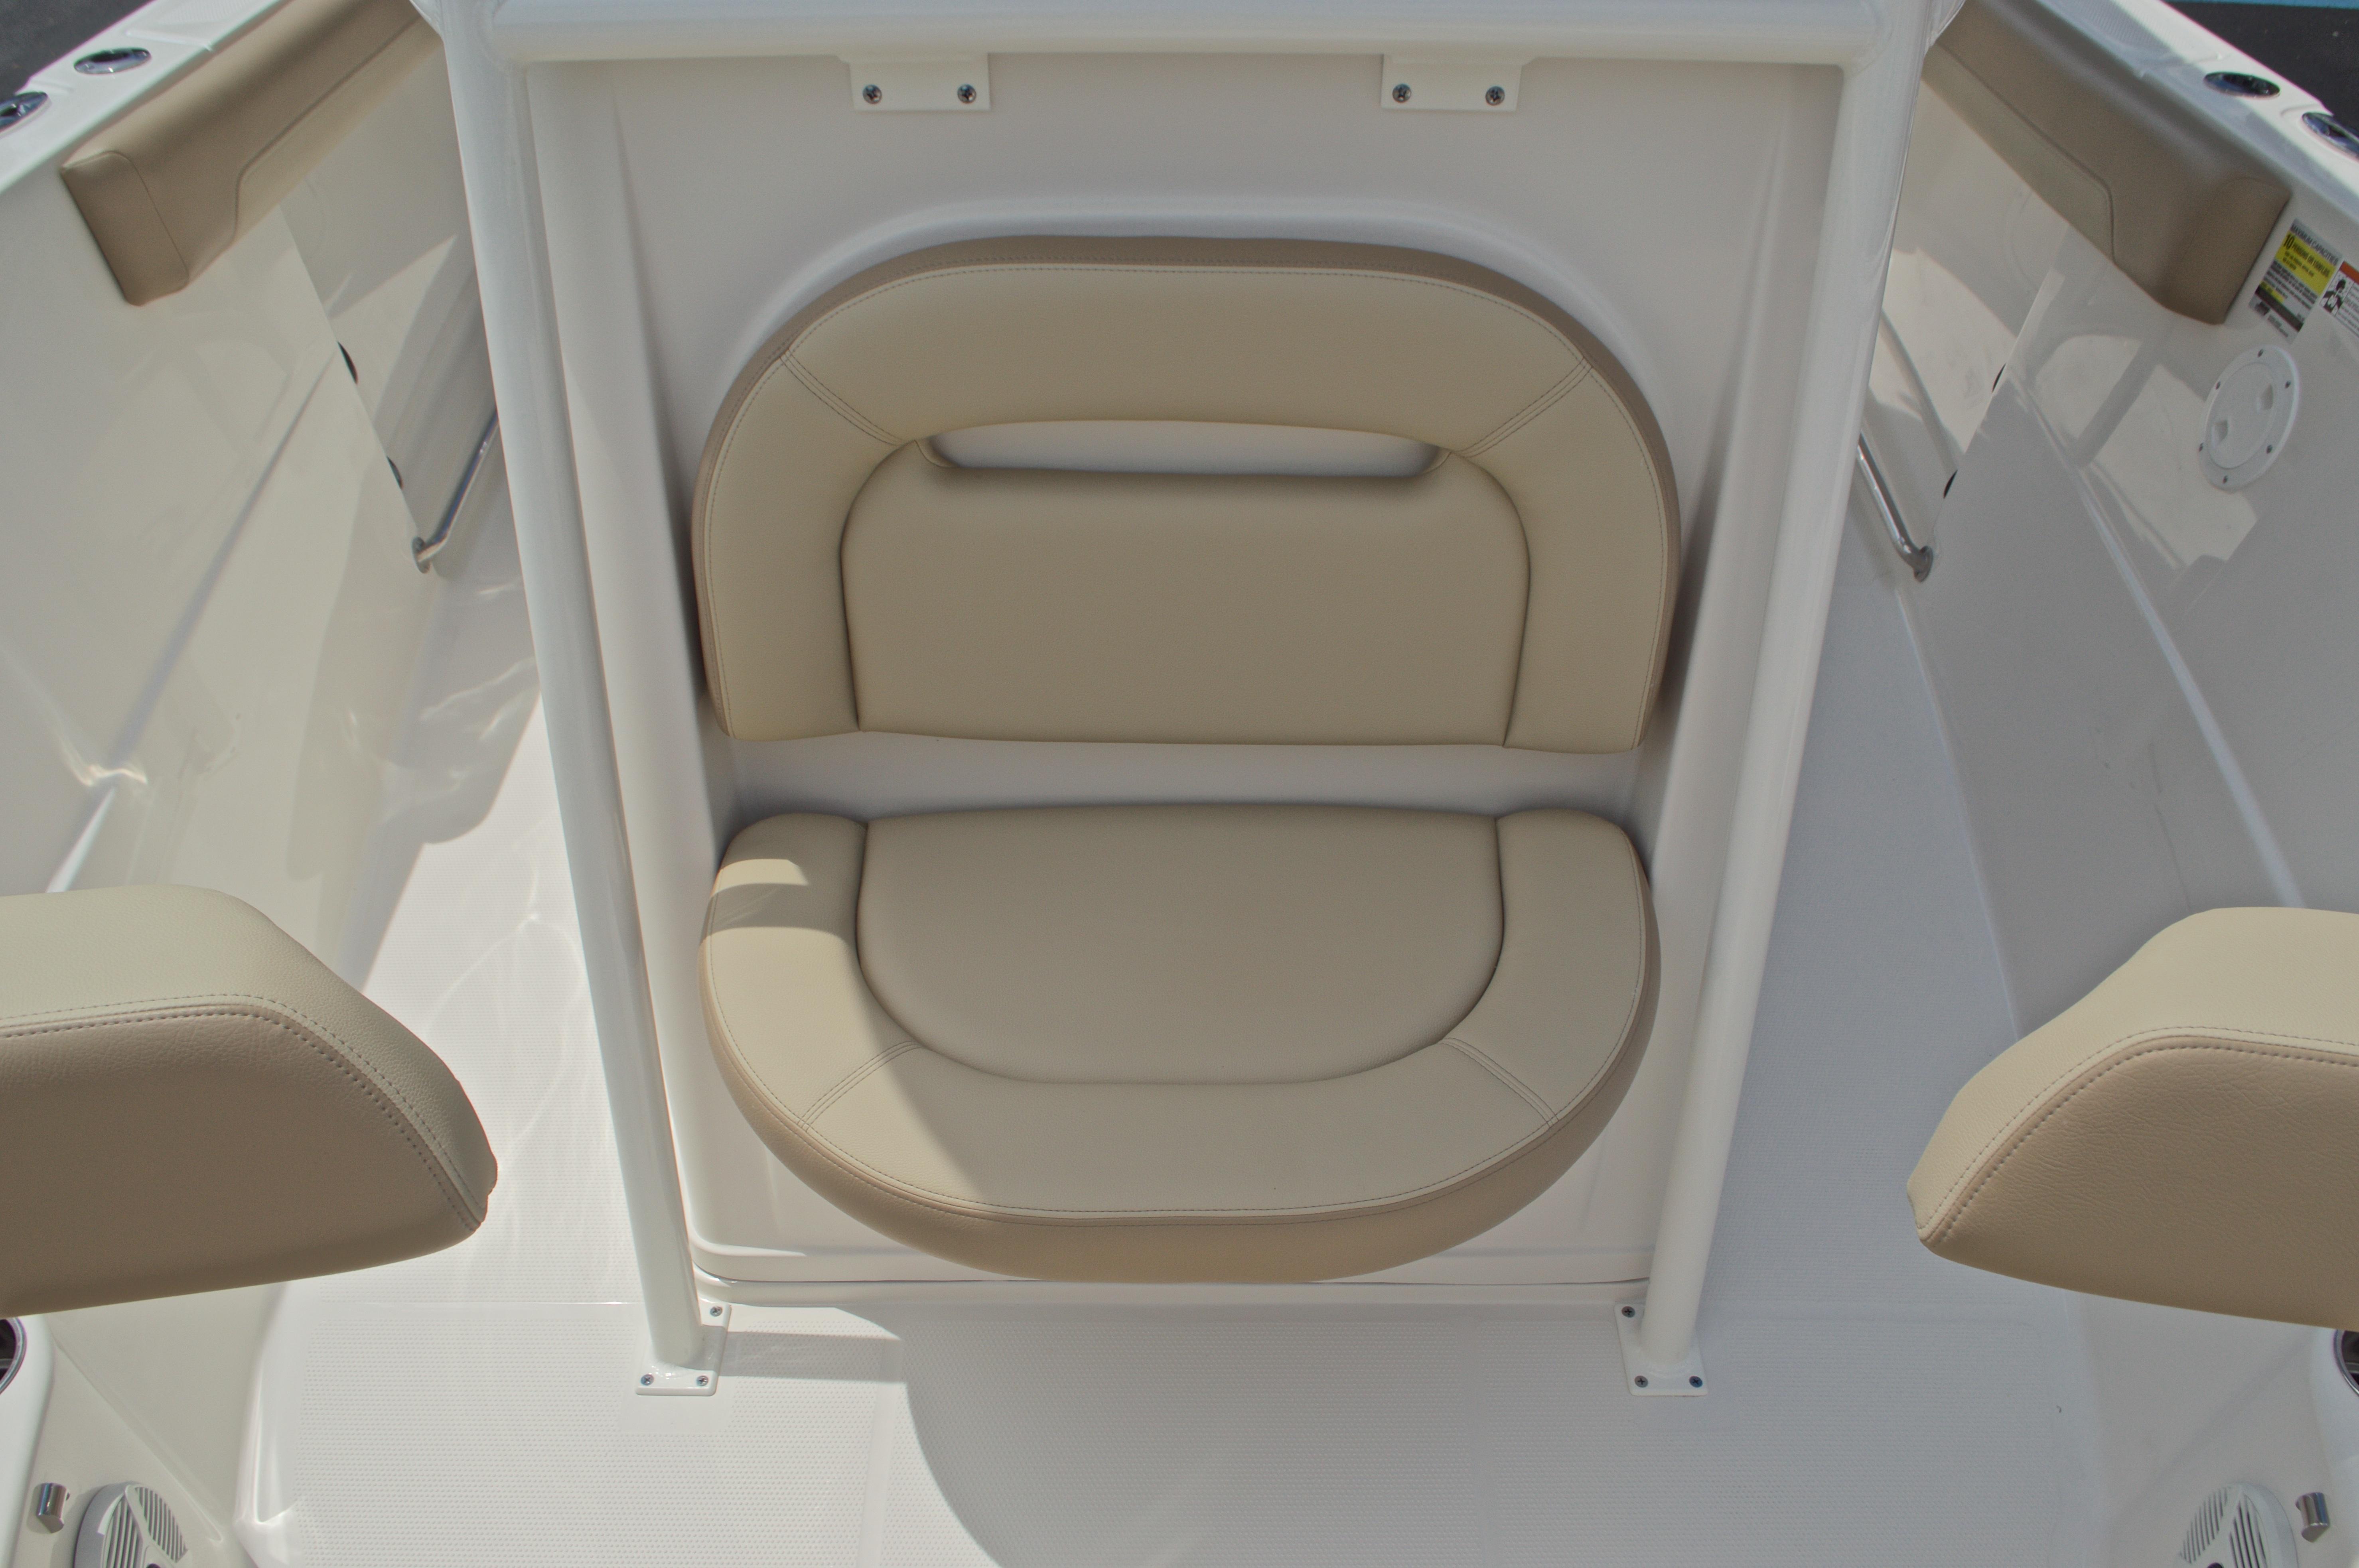 Thumbnail 45 for New 2017 Sailfish 240 CC Center Console boat for sale in Miami, FL